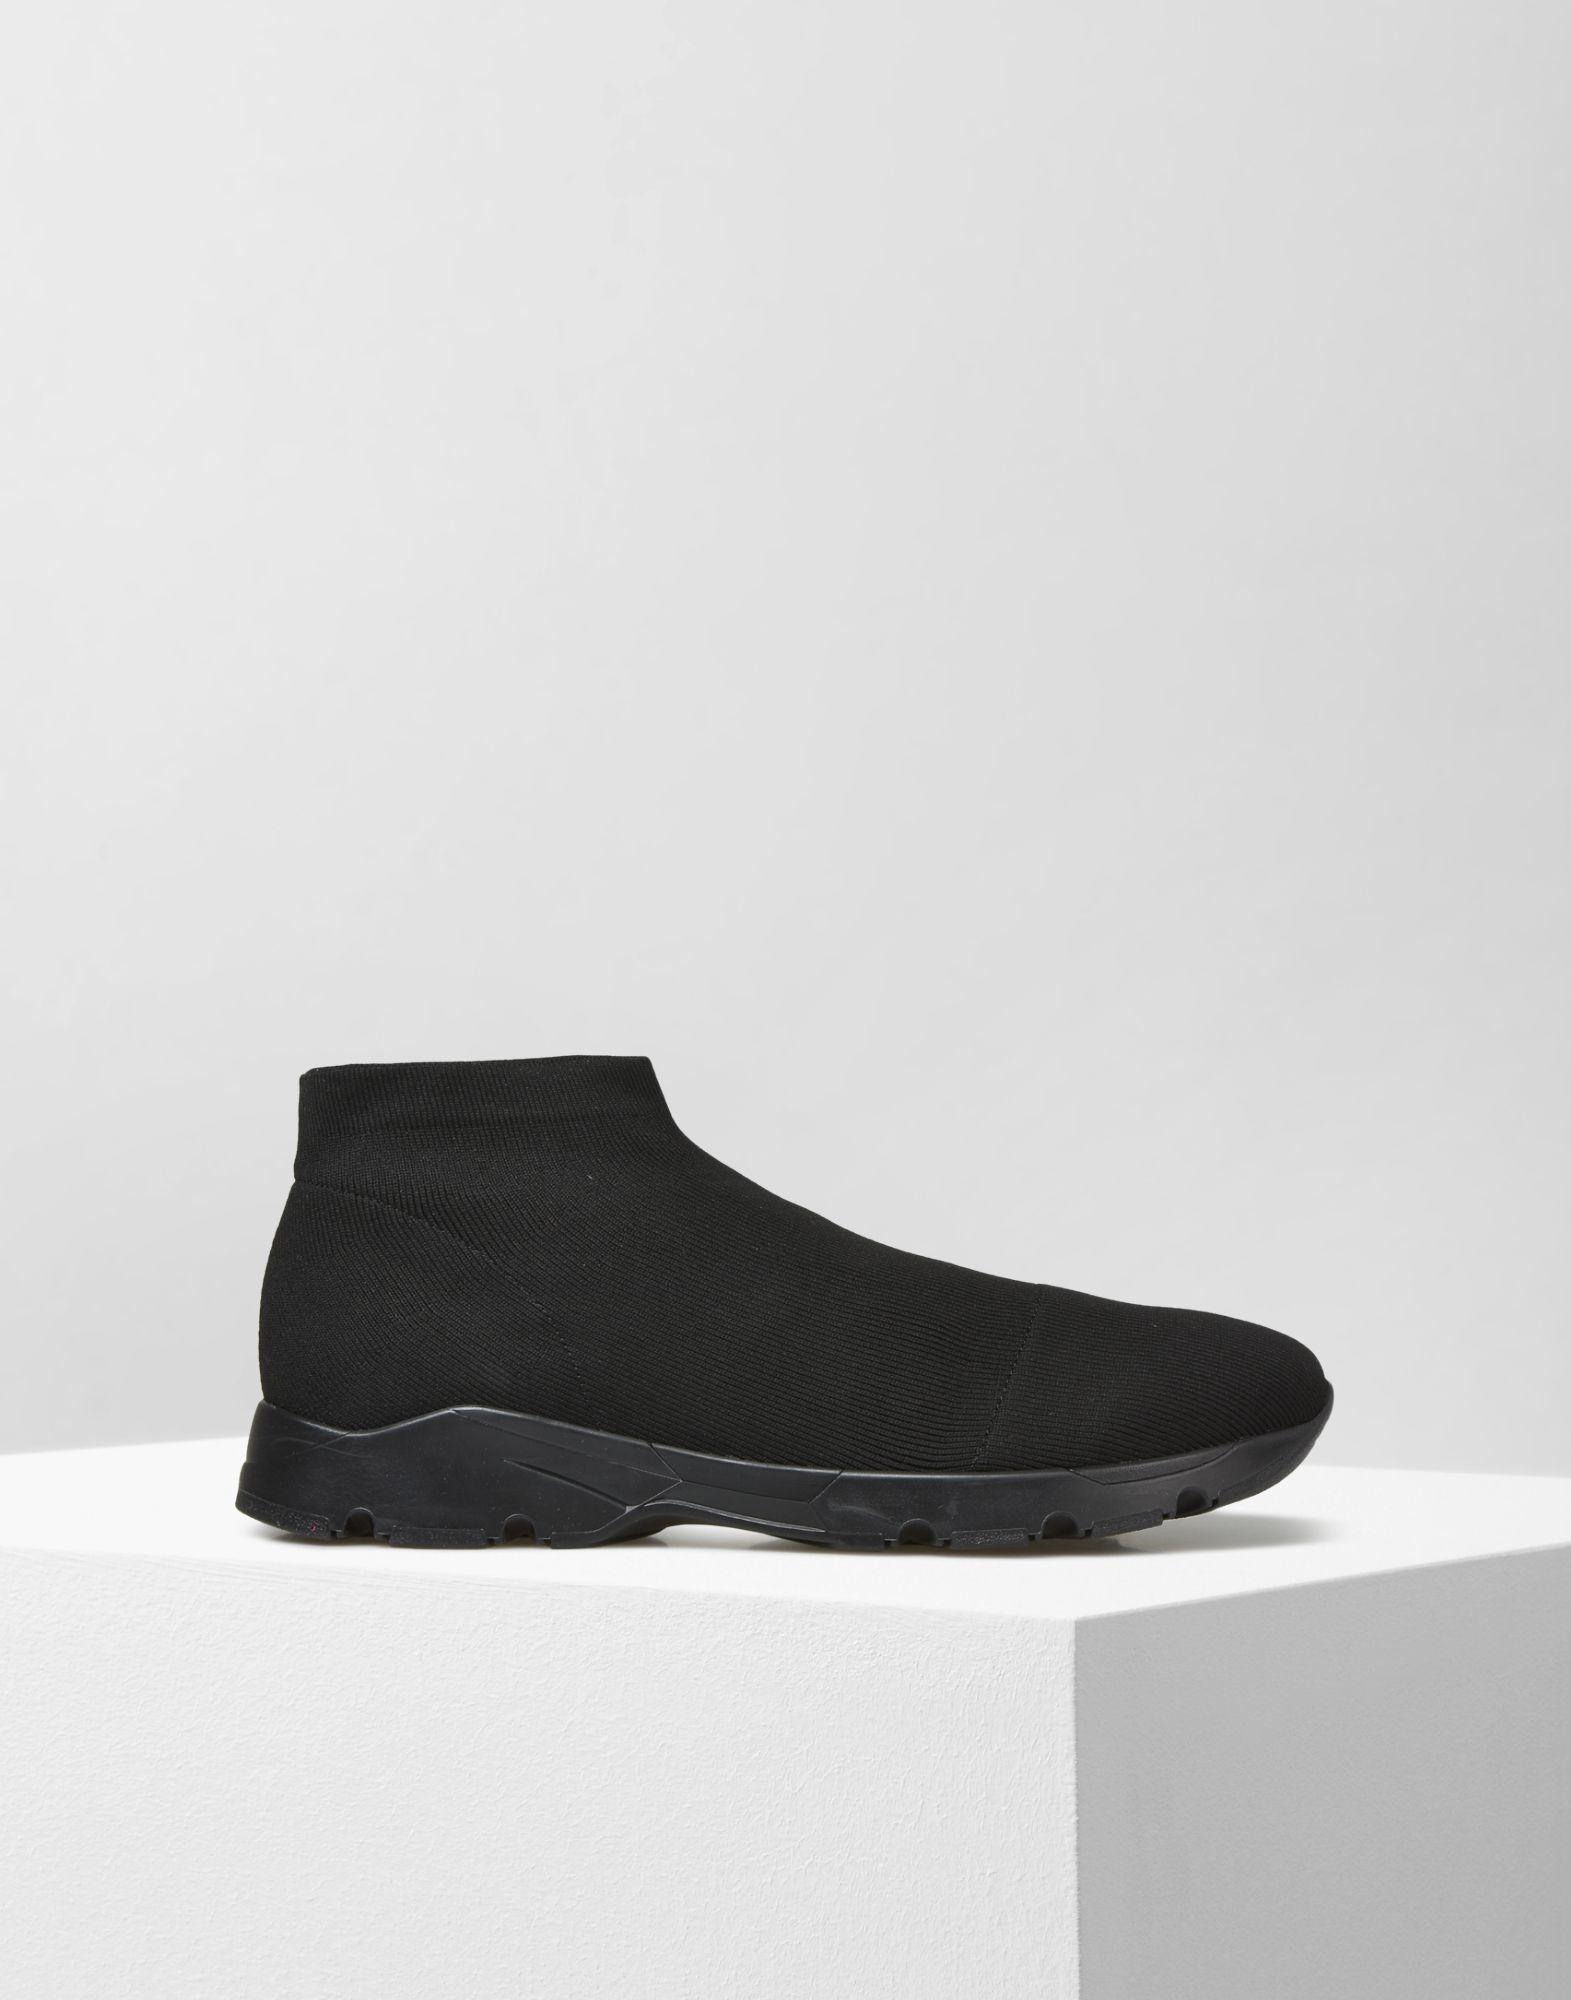 Lyst mm6 by maison martin margiela knit sneakers in black for Mm6 maison martin margiela